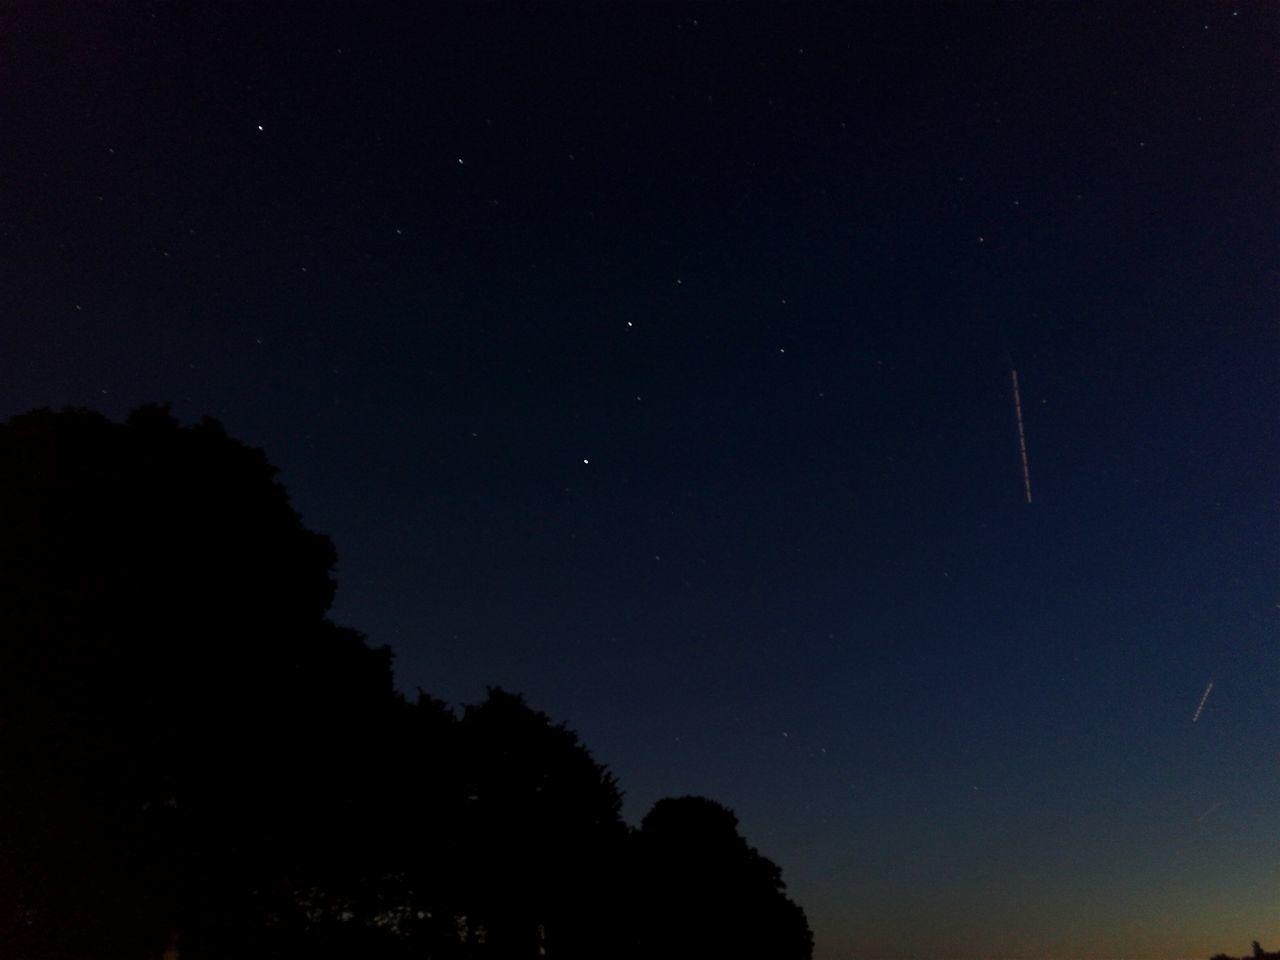 Astronomy Star - Space Night Space Nature Constellation Sky Constellation Nightphotography Night Sky Stars Clear Sky Beauty In Nature Nature Silhouette Tree HuaweiP9Photography HuaweiP9 Huaweiphotography Huawei P9 Leica